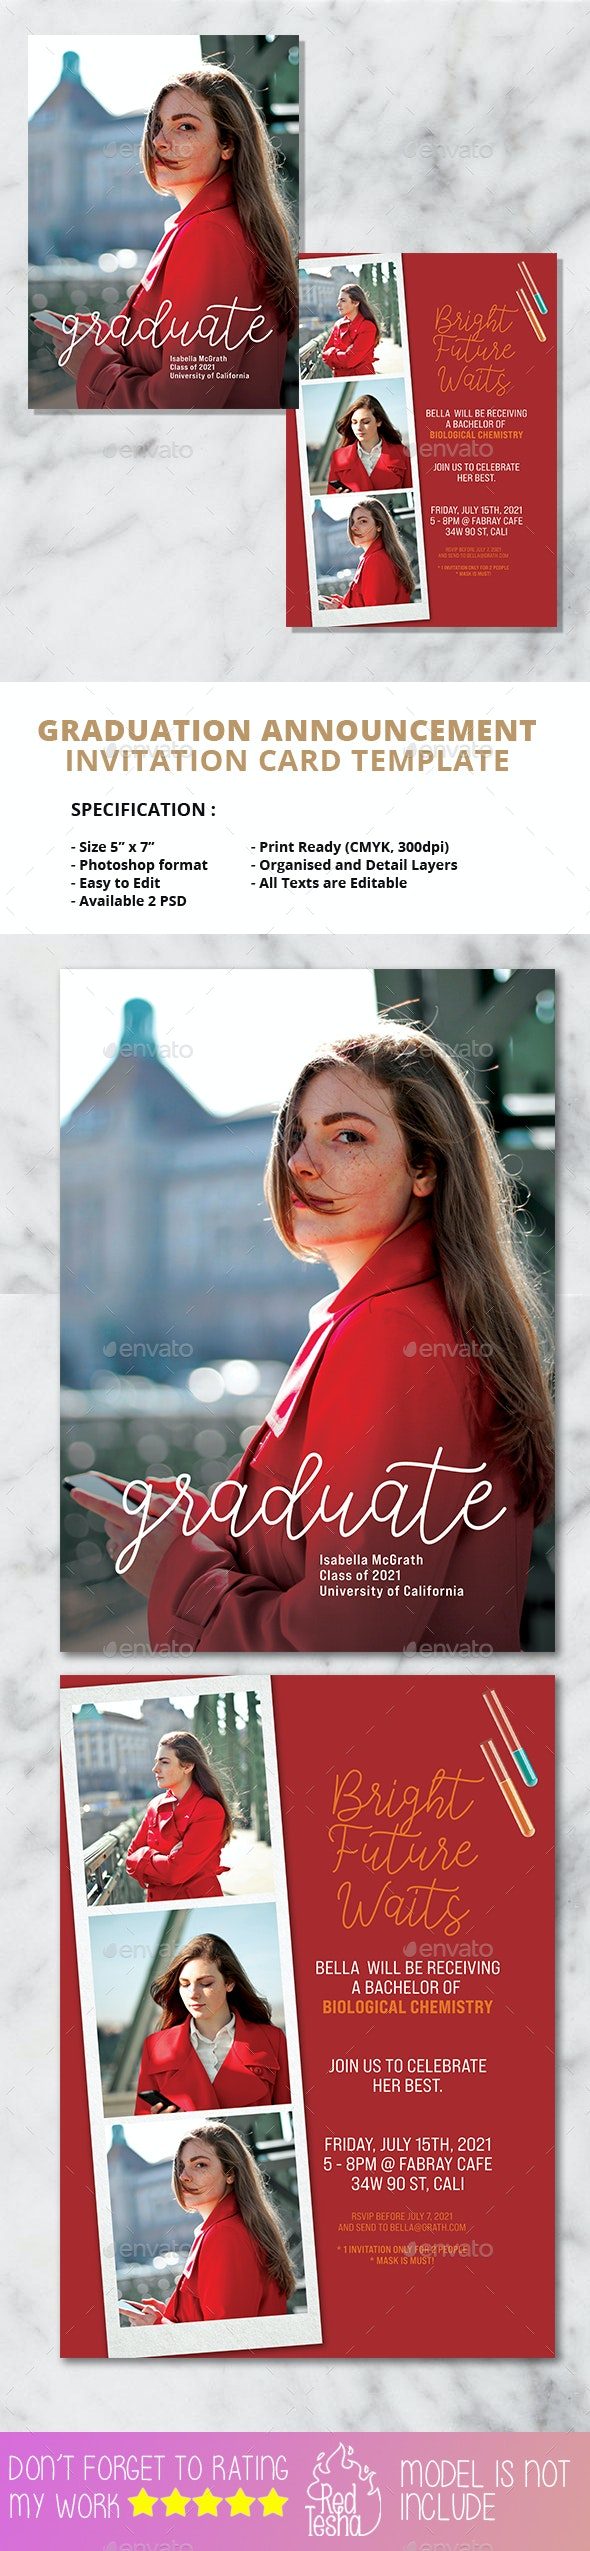 2 PSD Graduation Invitation Card - Invitations Cards & Invites